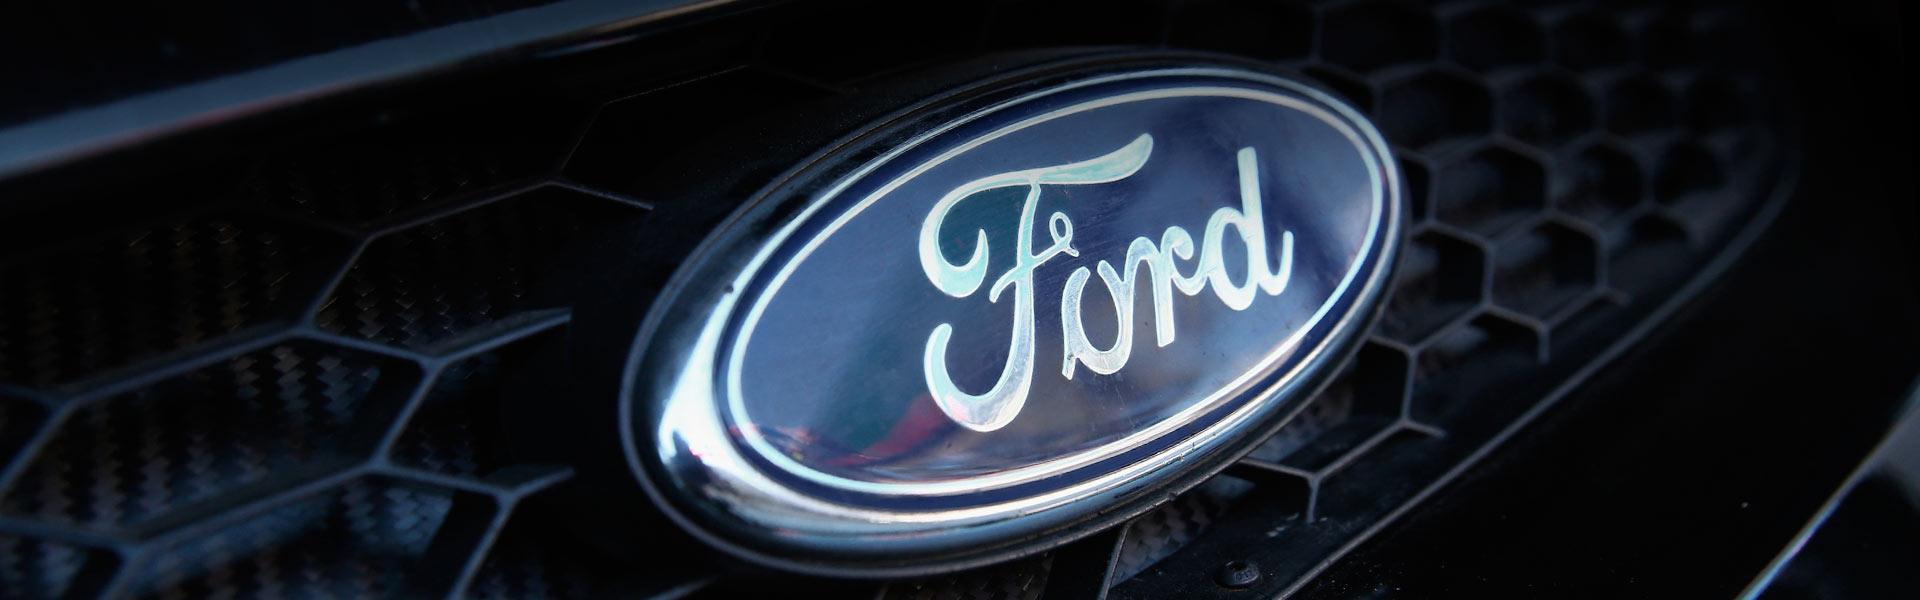 Замена вариатора Форд